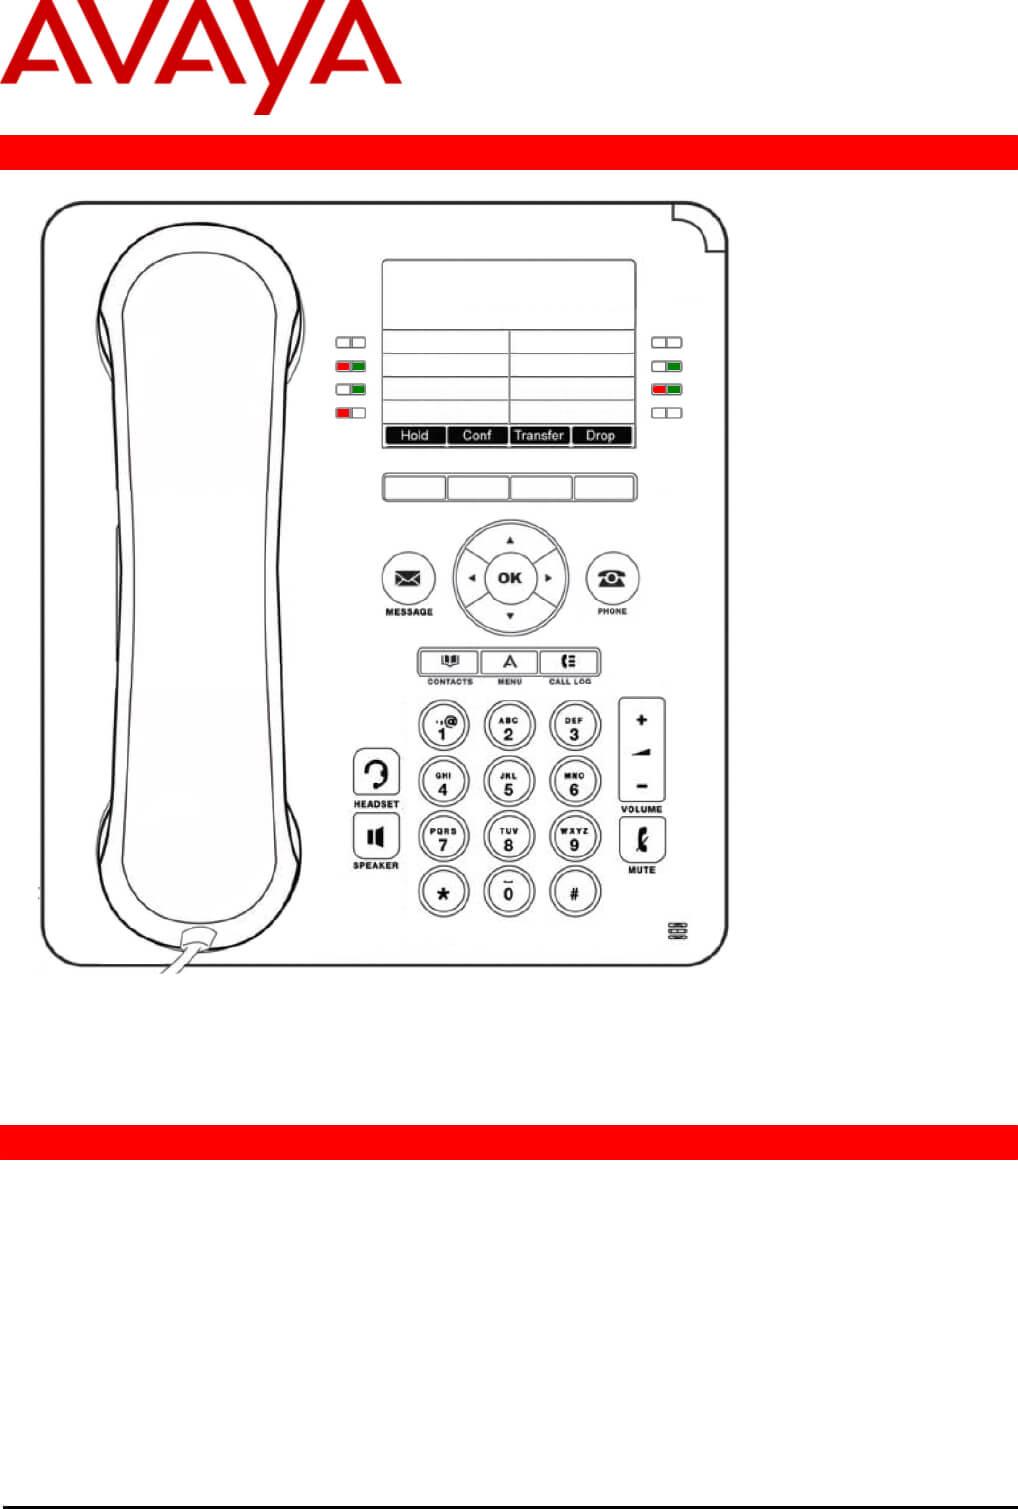 Avaya Telephone 9508 User Guide   Manualsonline In Avaya Phone Label Template